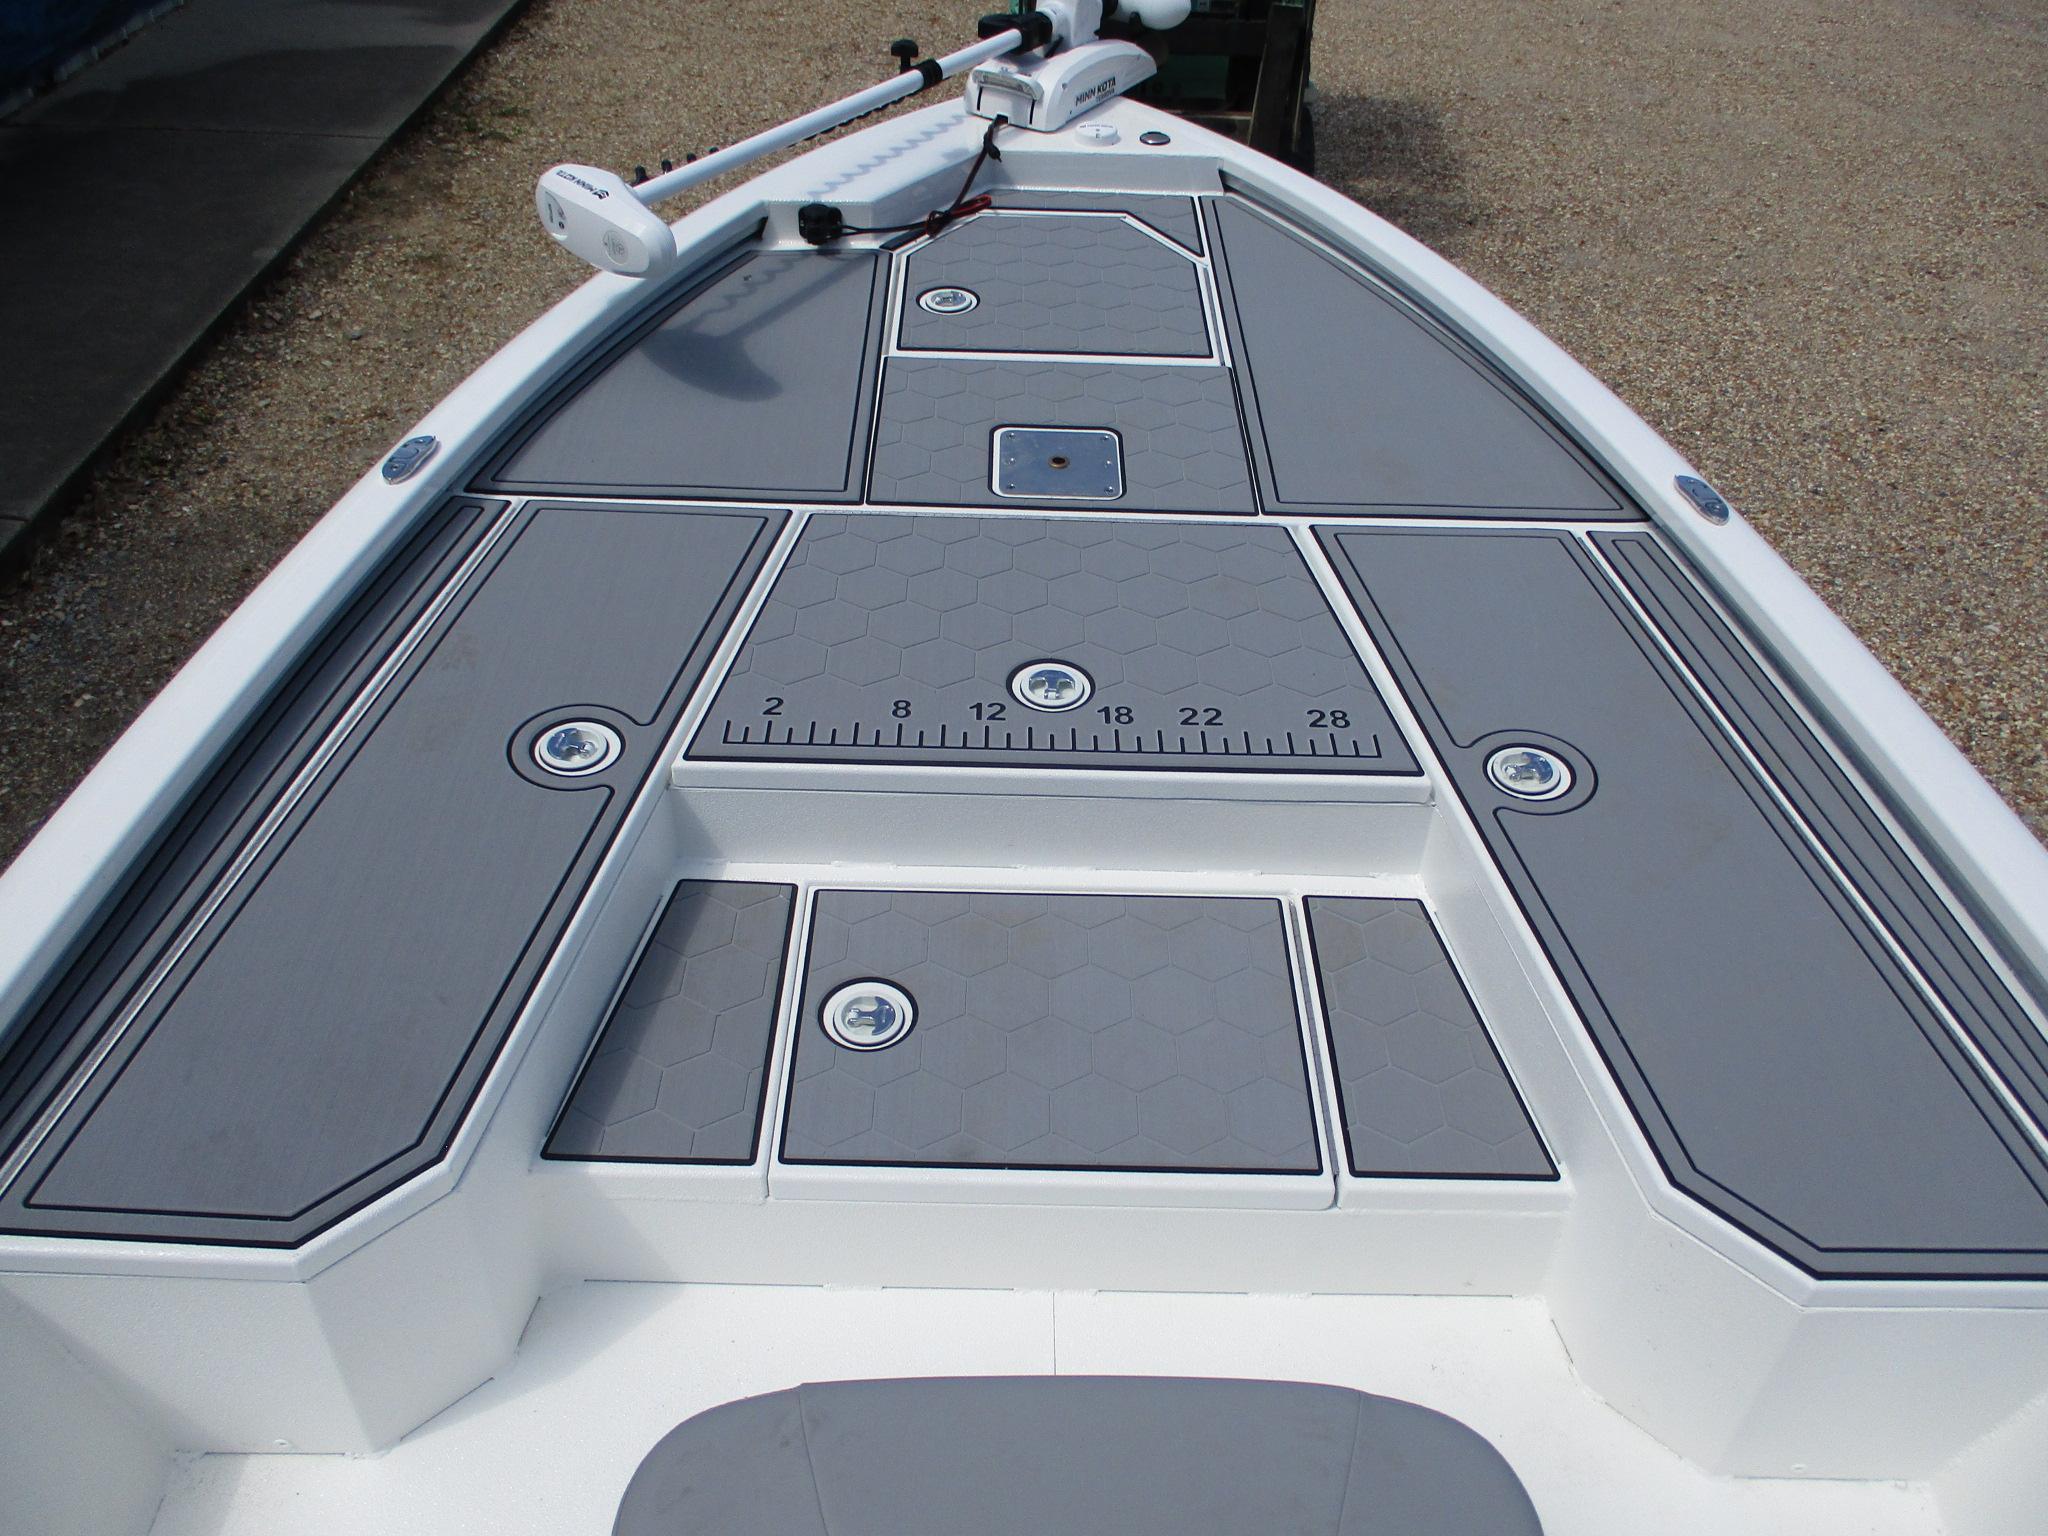 New  2021 20.57' Avid 21 FS Bay Boat in Slidell, Louisiana